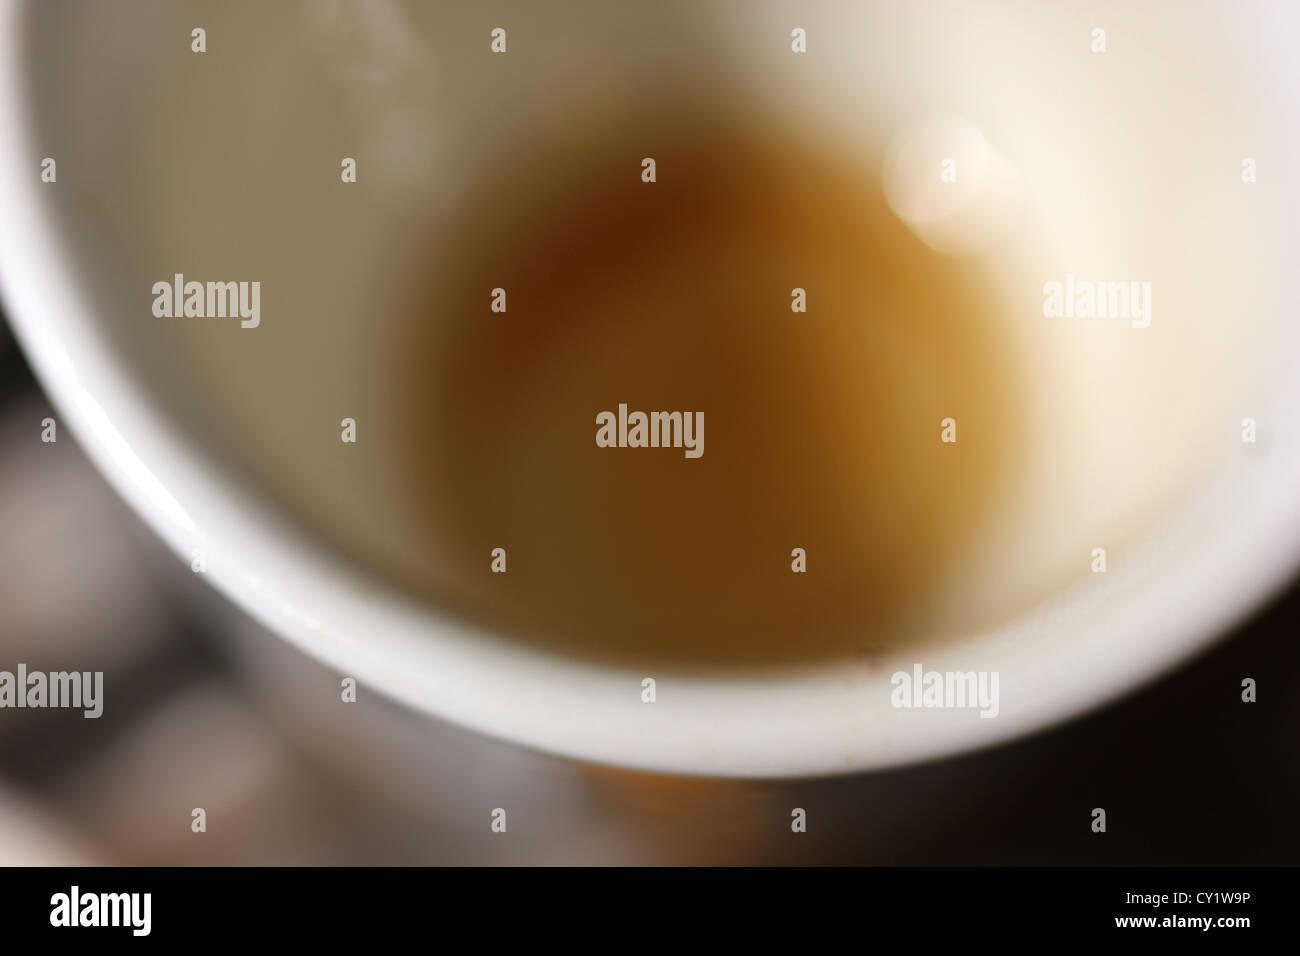 coffee cup detail, photoarkive Stock Photo